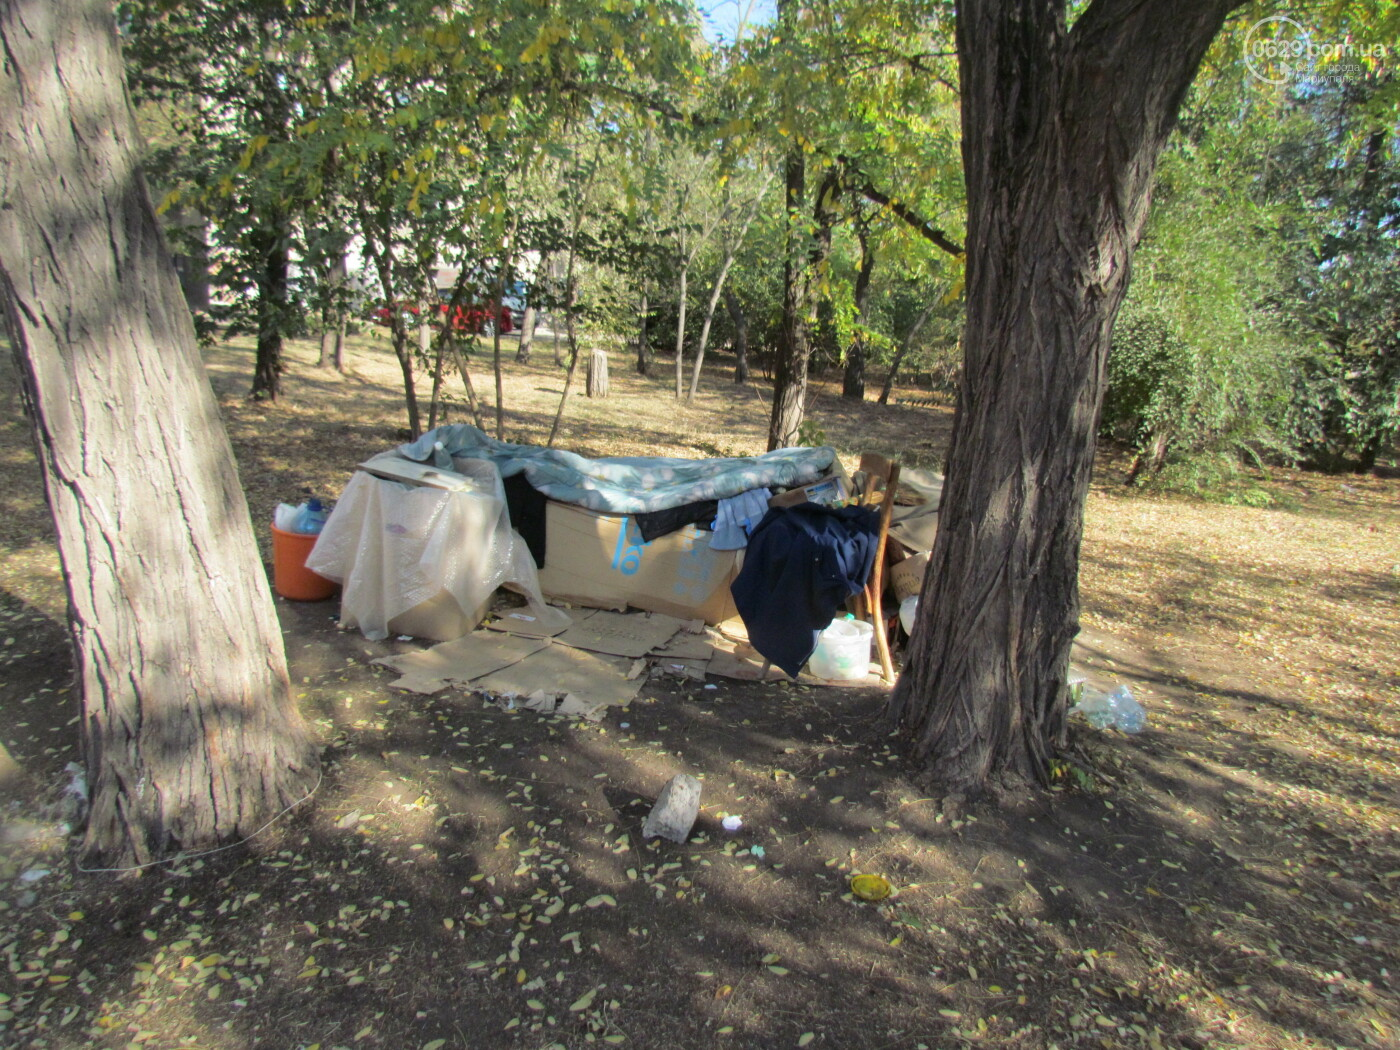 """Баба Роза"". Как жительница Киргизстана оказалась без дома и родни в Мариуполе, - ФОТО, фото-5"